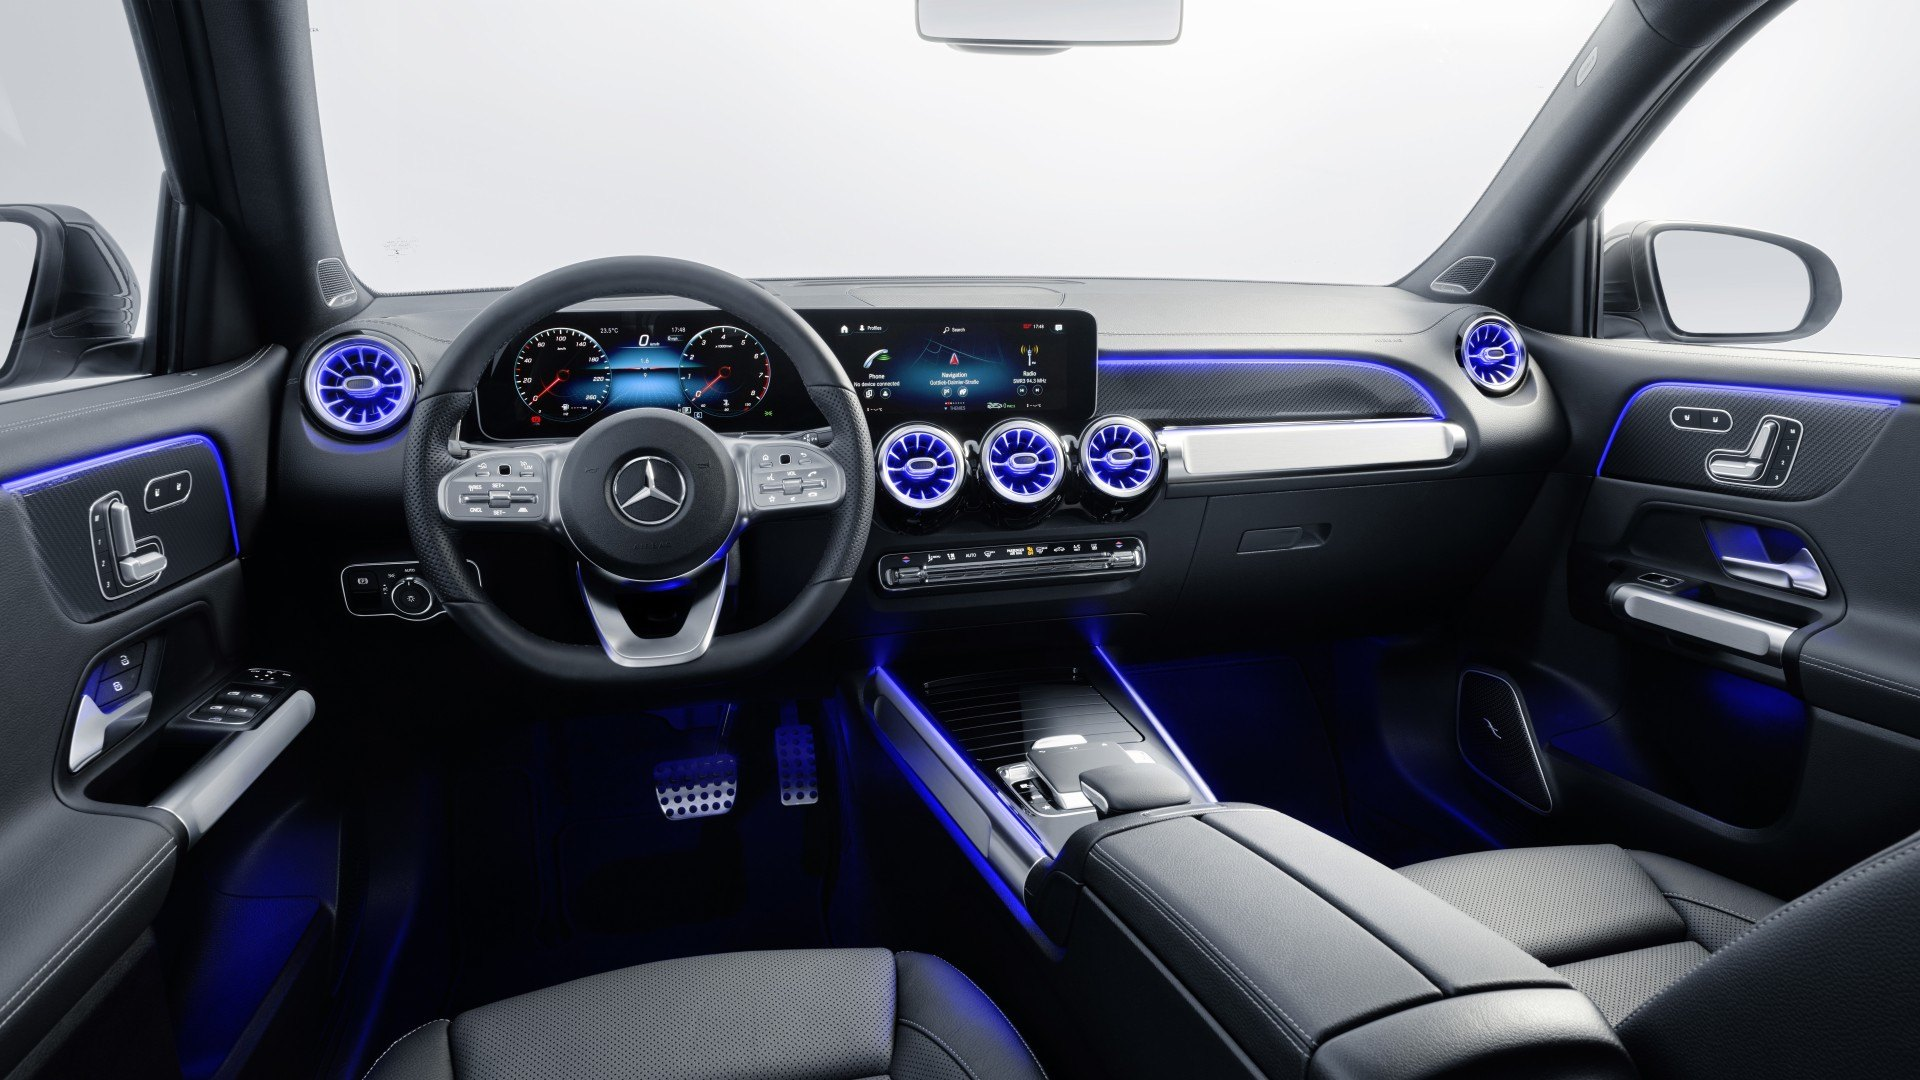 Mercedes Benz GLB 180 2020 (3)